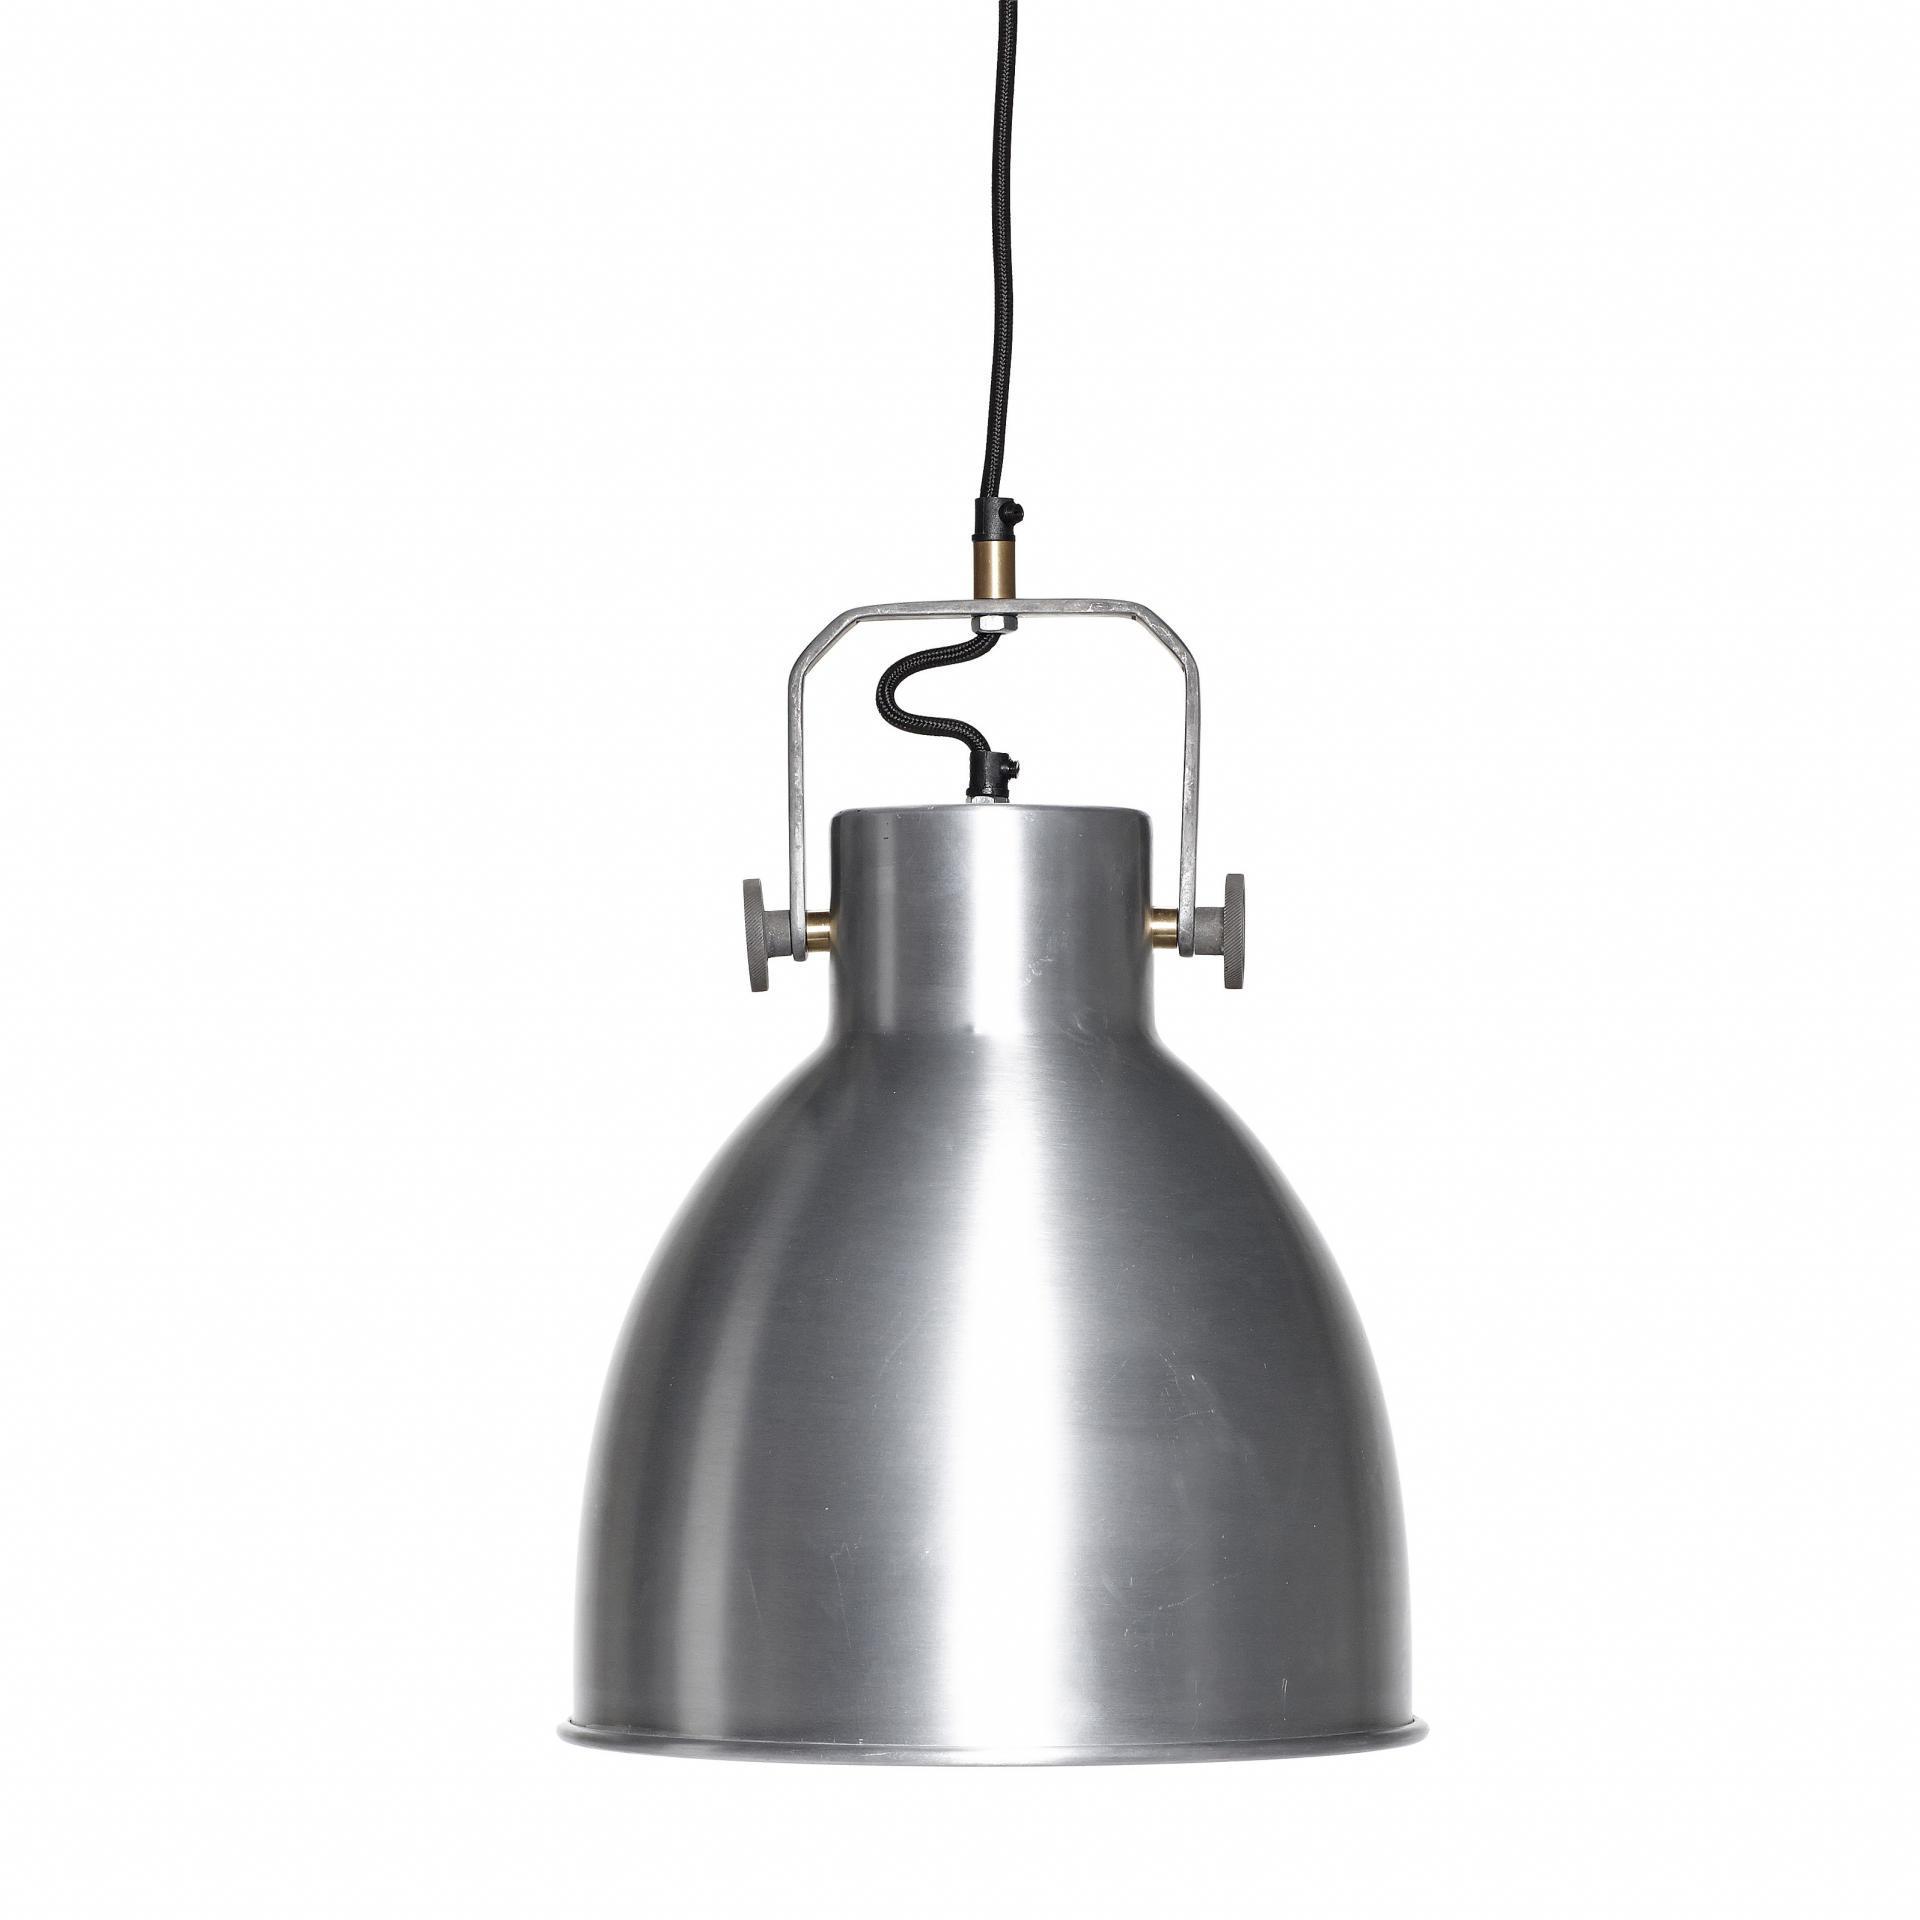 Hübsch Závěsná lampa Silver industrial, stříbrná barva, kov